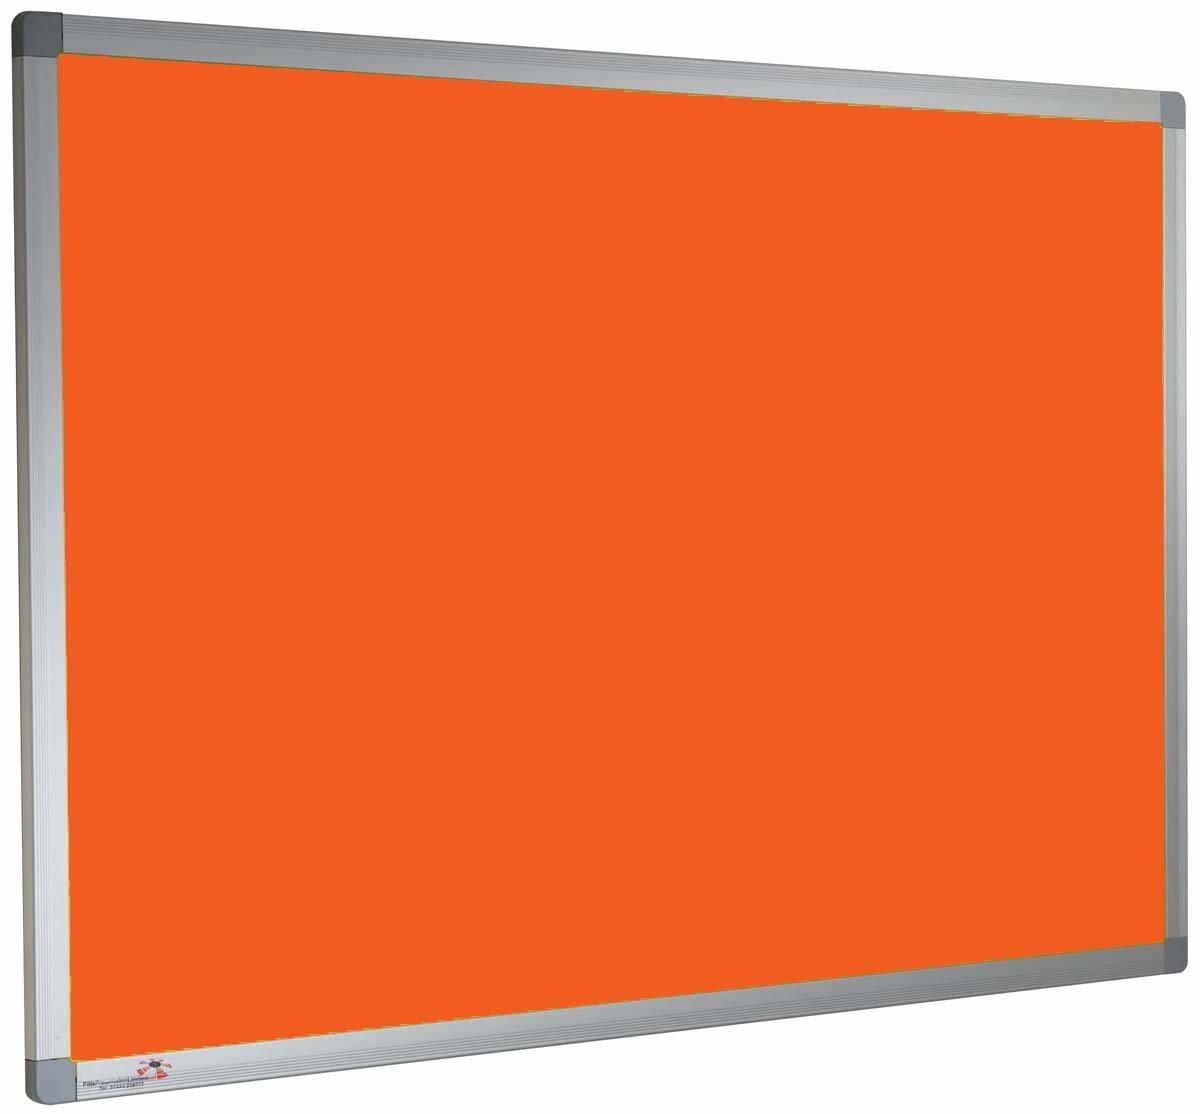 Amethyst Pitts Presentation 900 x 600 mm Charles TwiteClass 1 Aluminium Framed Noticeboard